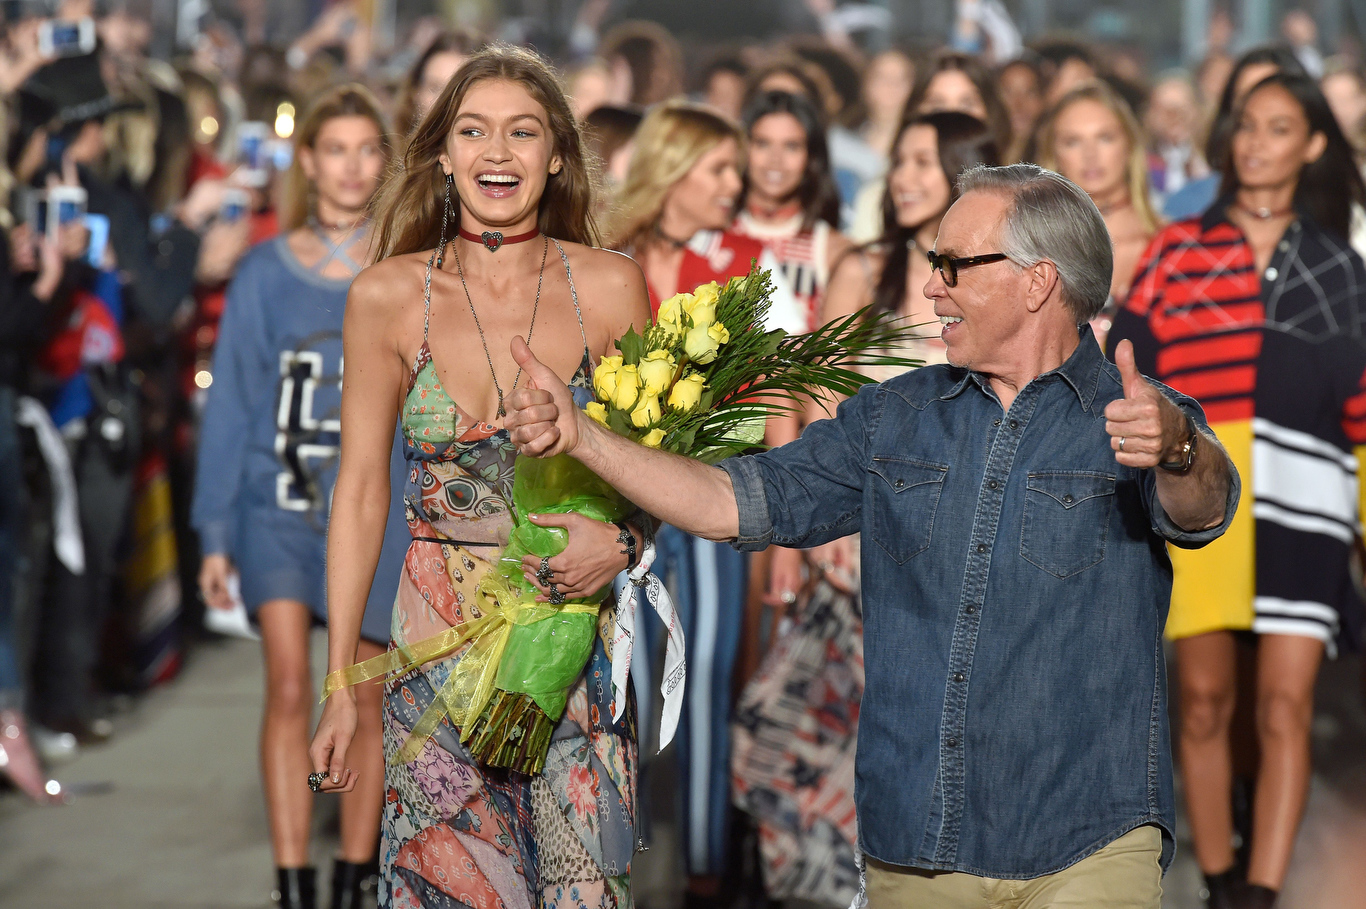 Gigi Hadid and Tommy Hilfiger on the catwalk